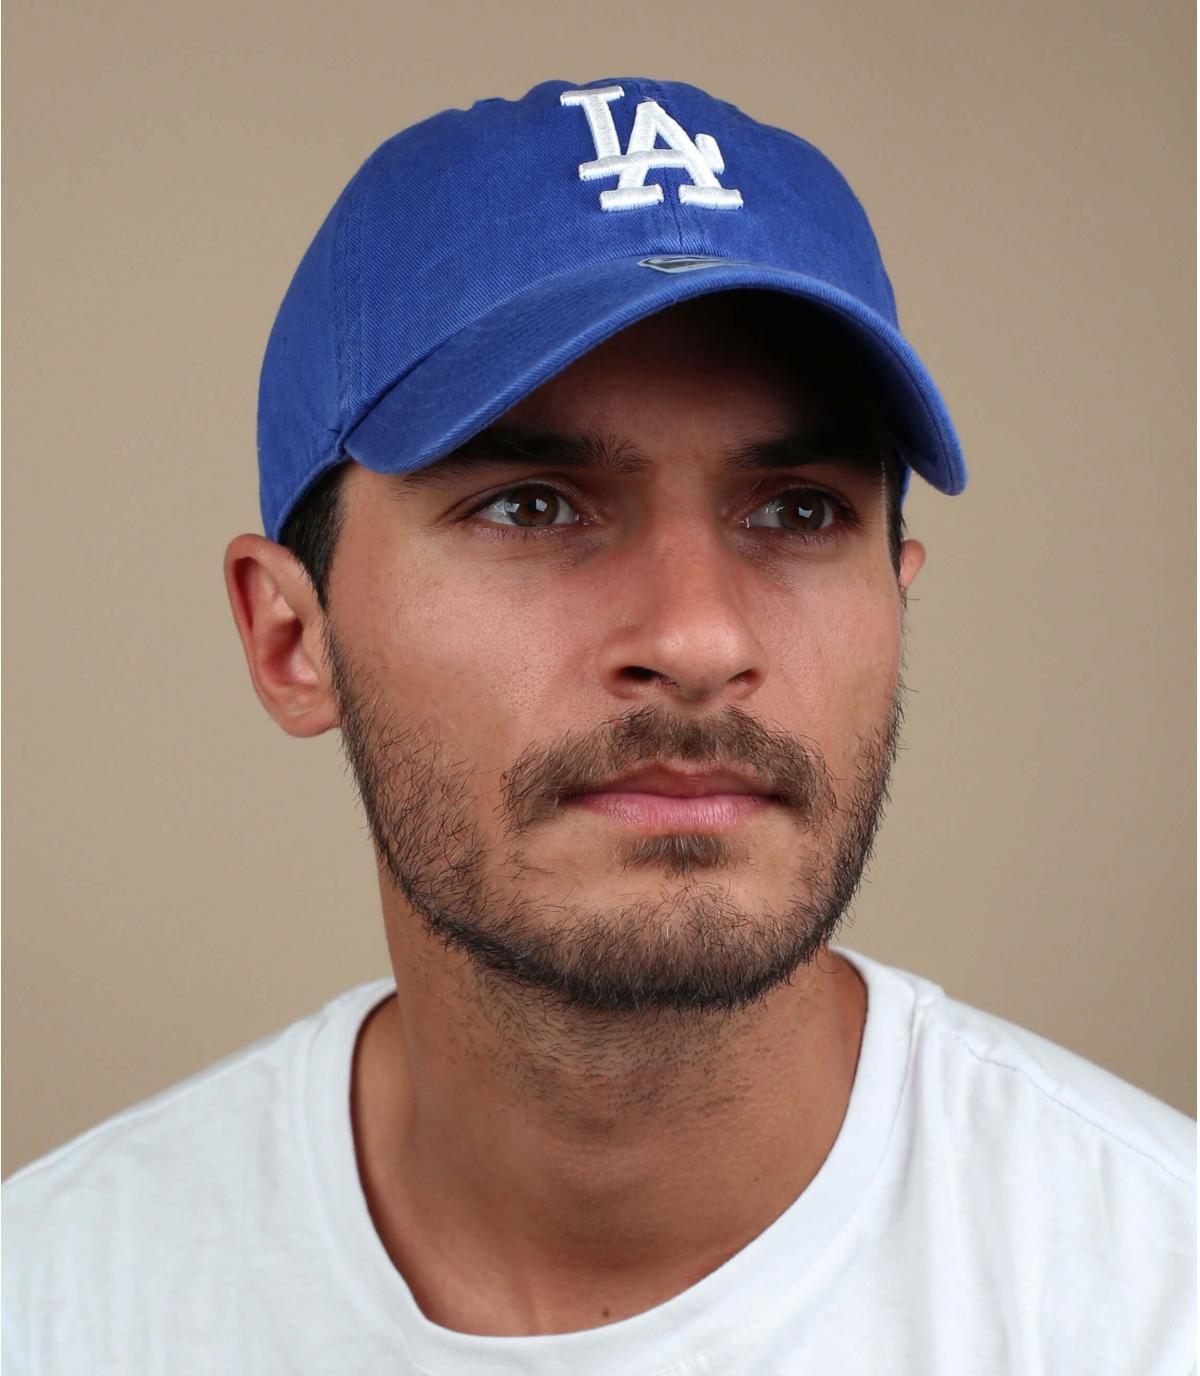 Cappellino visiera curva LA blu